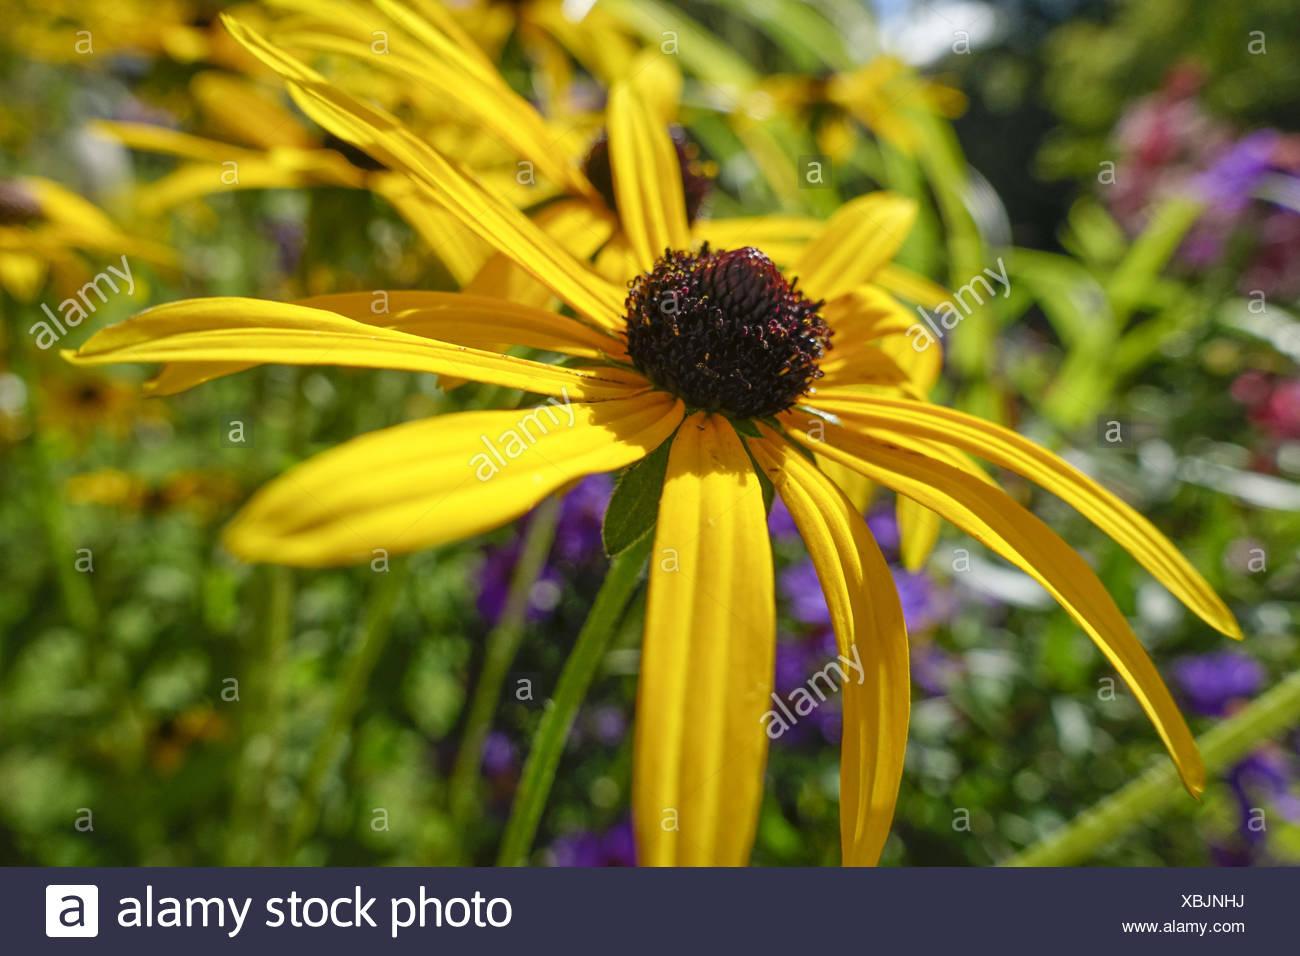 Garten-Sonnenhut (Rudbeckia fulgida var deamii), Goldsturm flower (Rudbeckia fulgida var deamii), asteraceae, background, black, - Stock Image